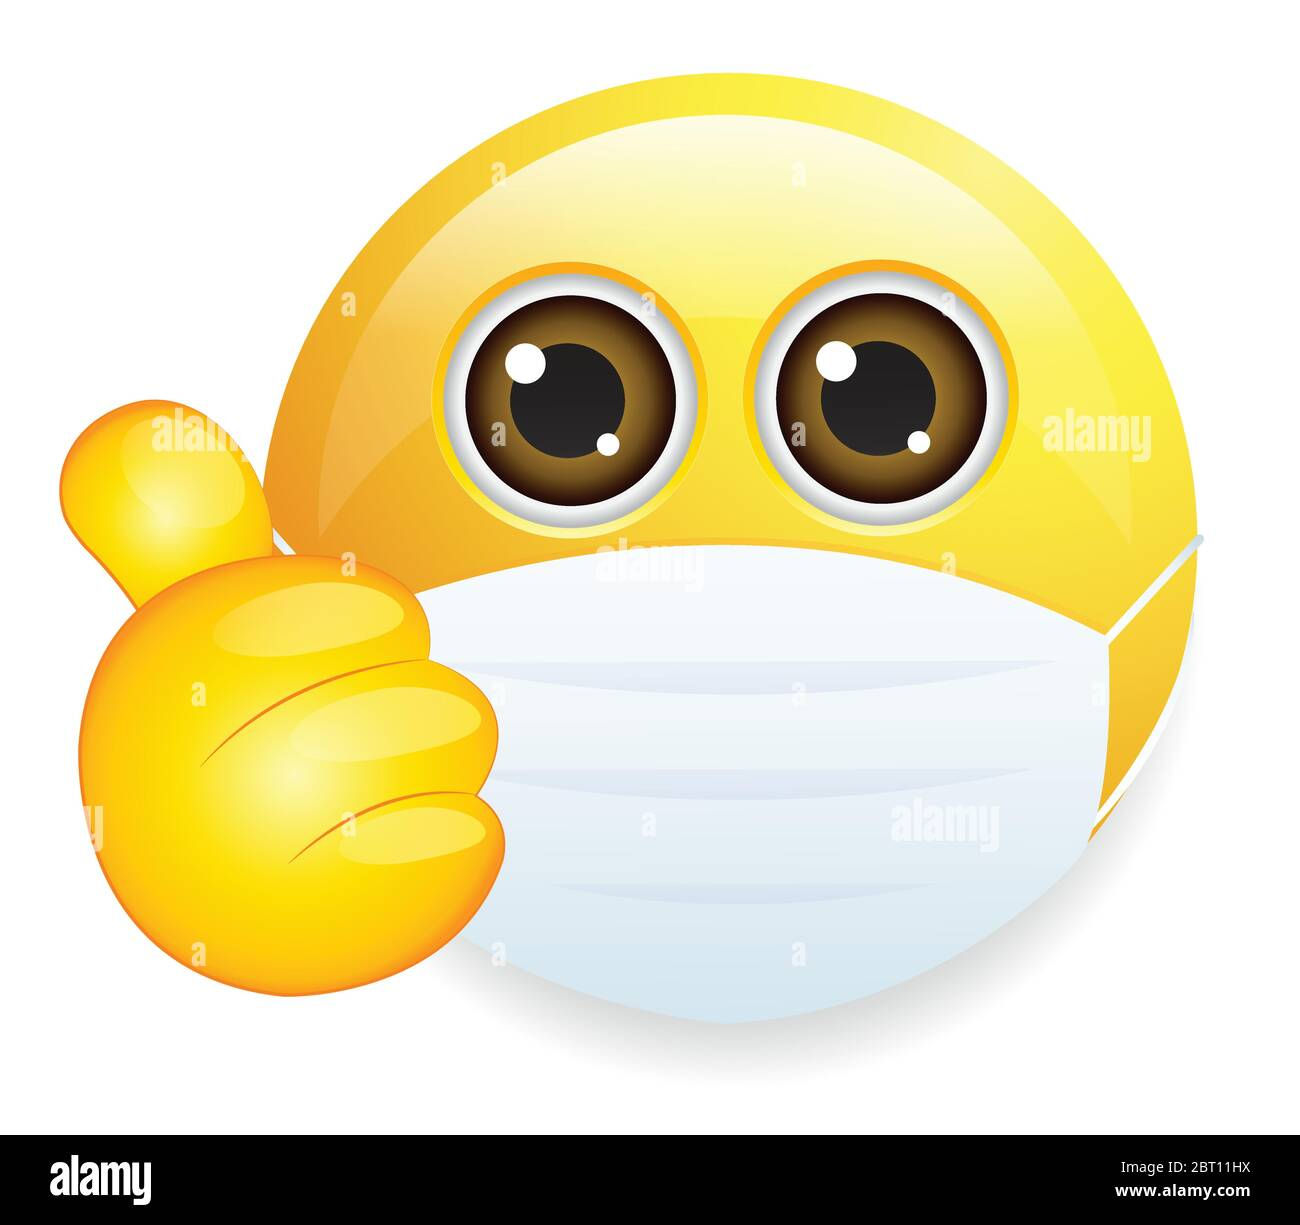 Emoticon Smiley Face Yellow Web Banque D Image Et Photos Page 6 Alamy